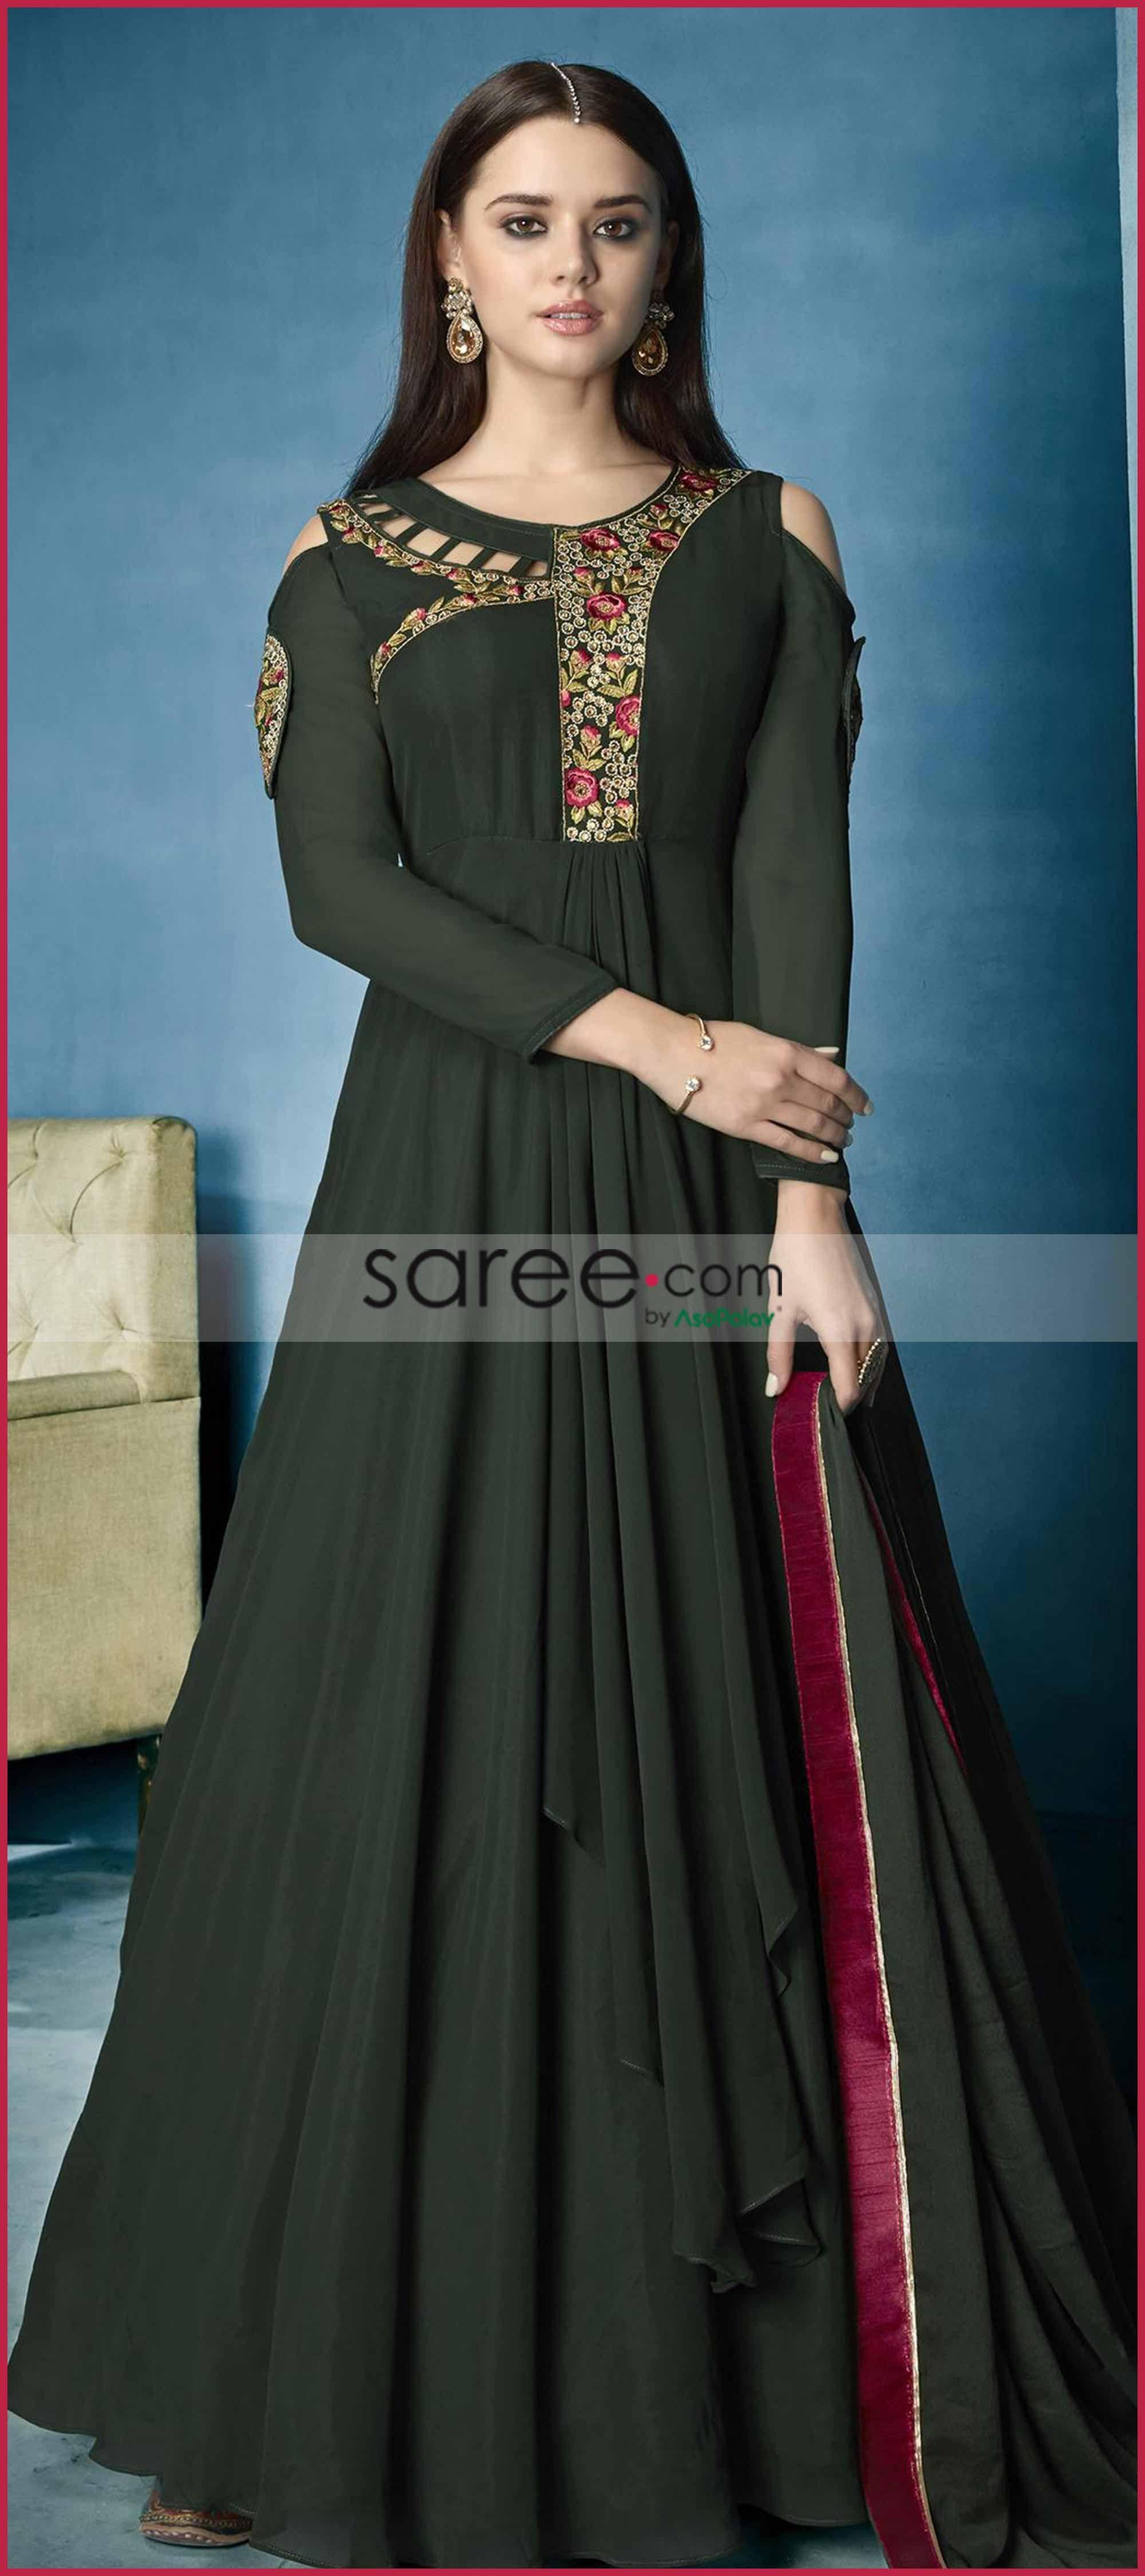 89bf24e525683 Dark Green Georgette Designer Cold Shoulder Anarkali Suit with Thread  Embroidery